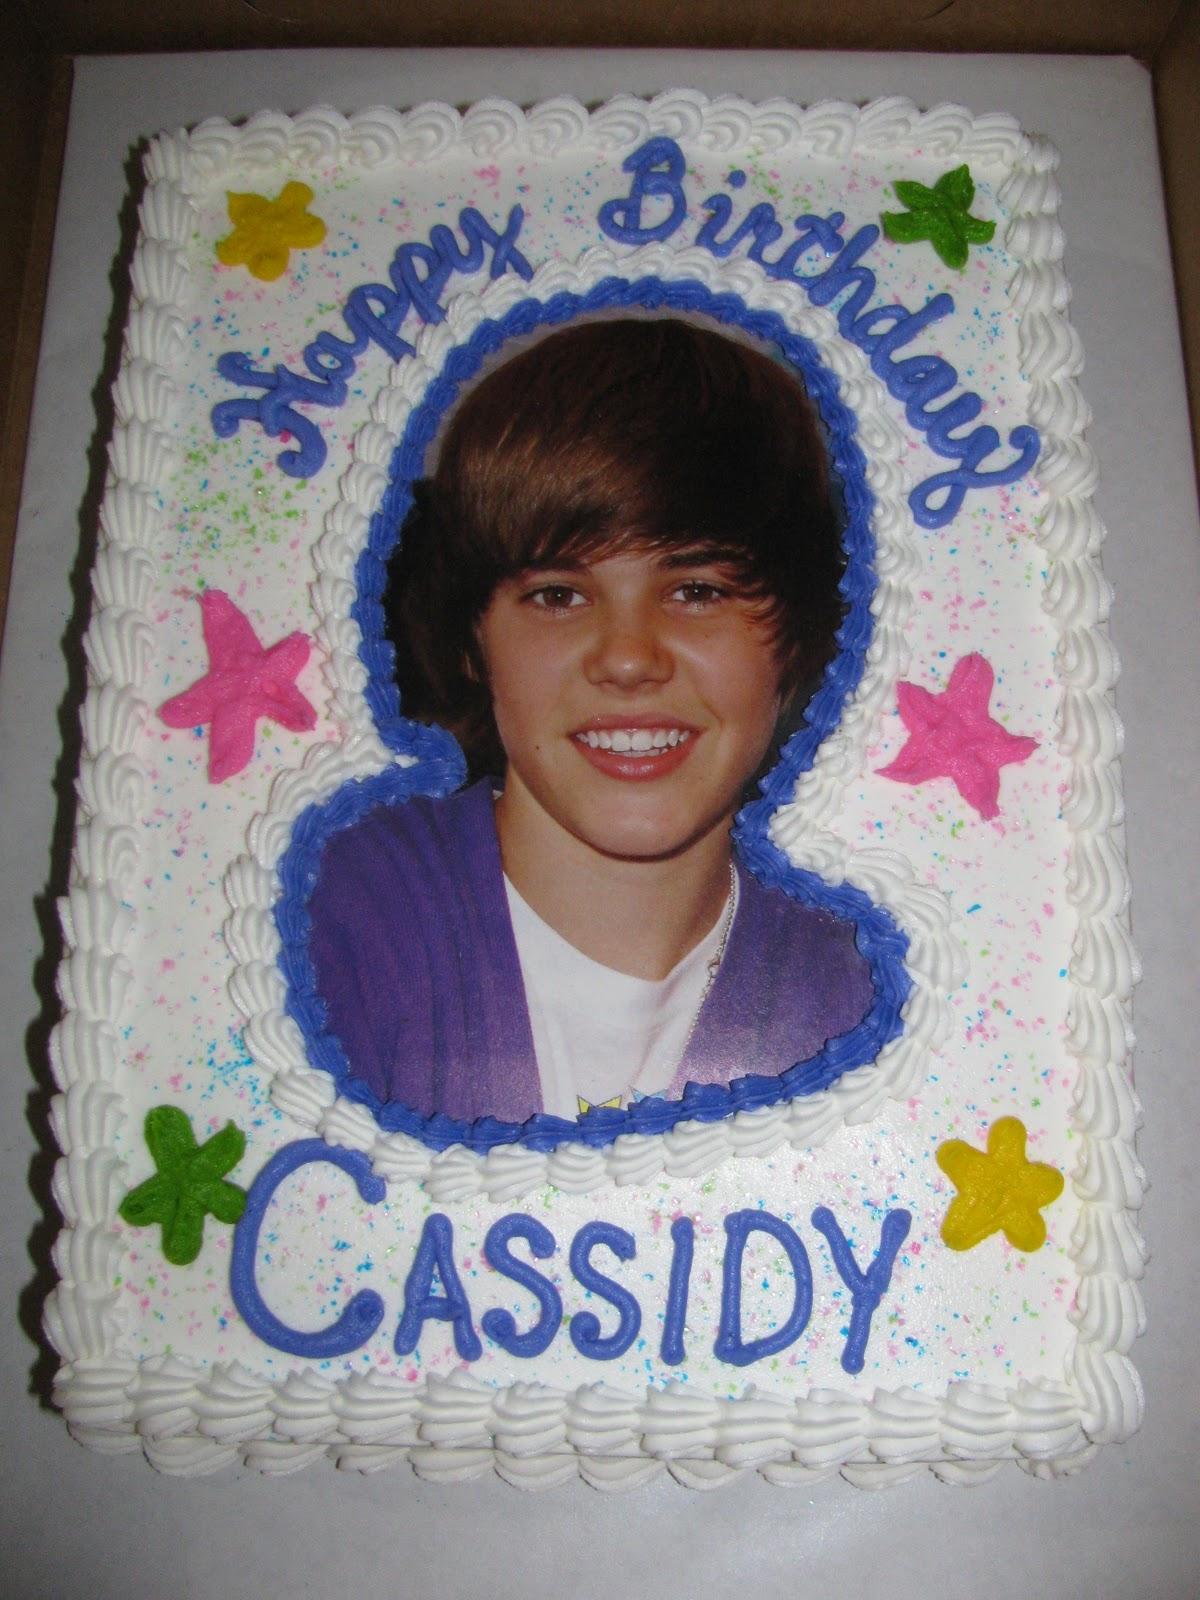 http://1.bp.blogspot.com/_gOC7cNxwXj0/TLngUIR2YUI/AAAAAAAAAU0/h6aRjfWapbg/s1600/Kids+and+Bieber+cake+031.JPG